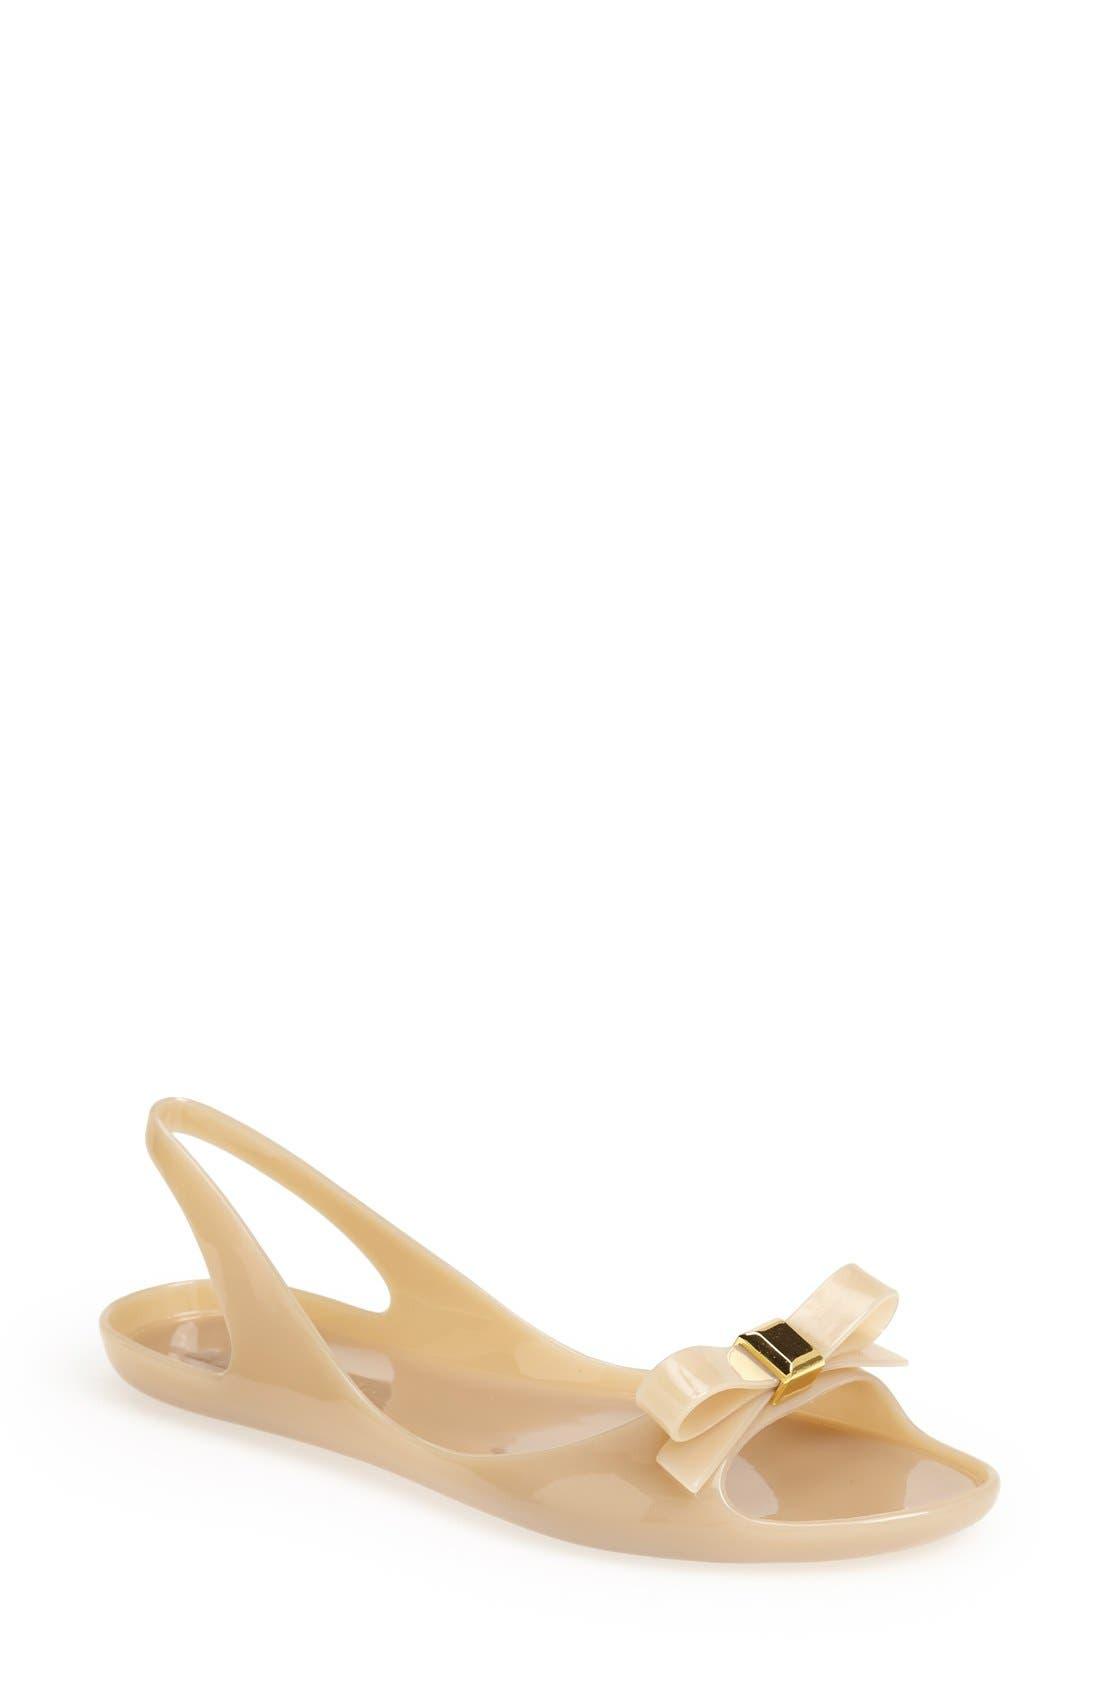 Alternate Image 1 Selected - kate spade new york 'ode' flat sandal